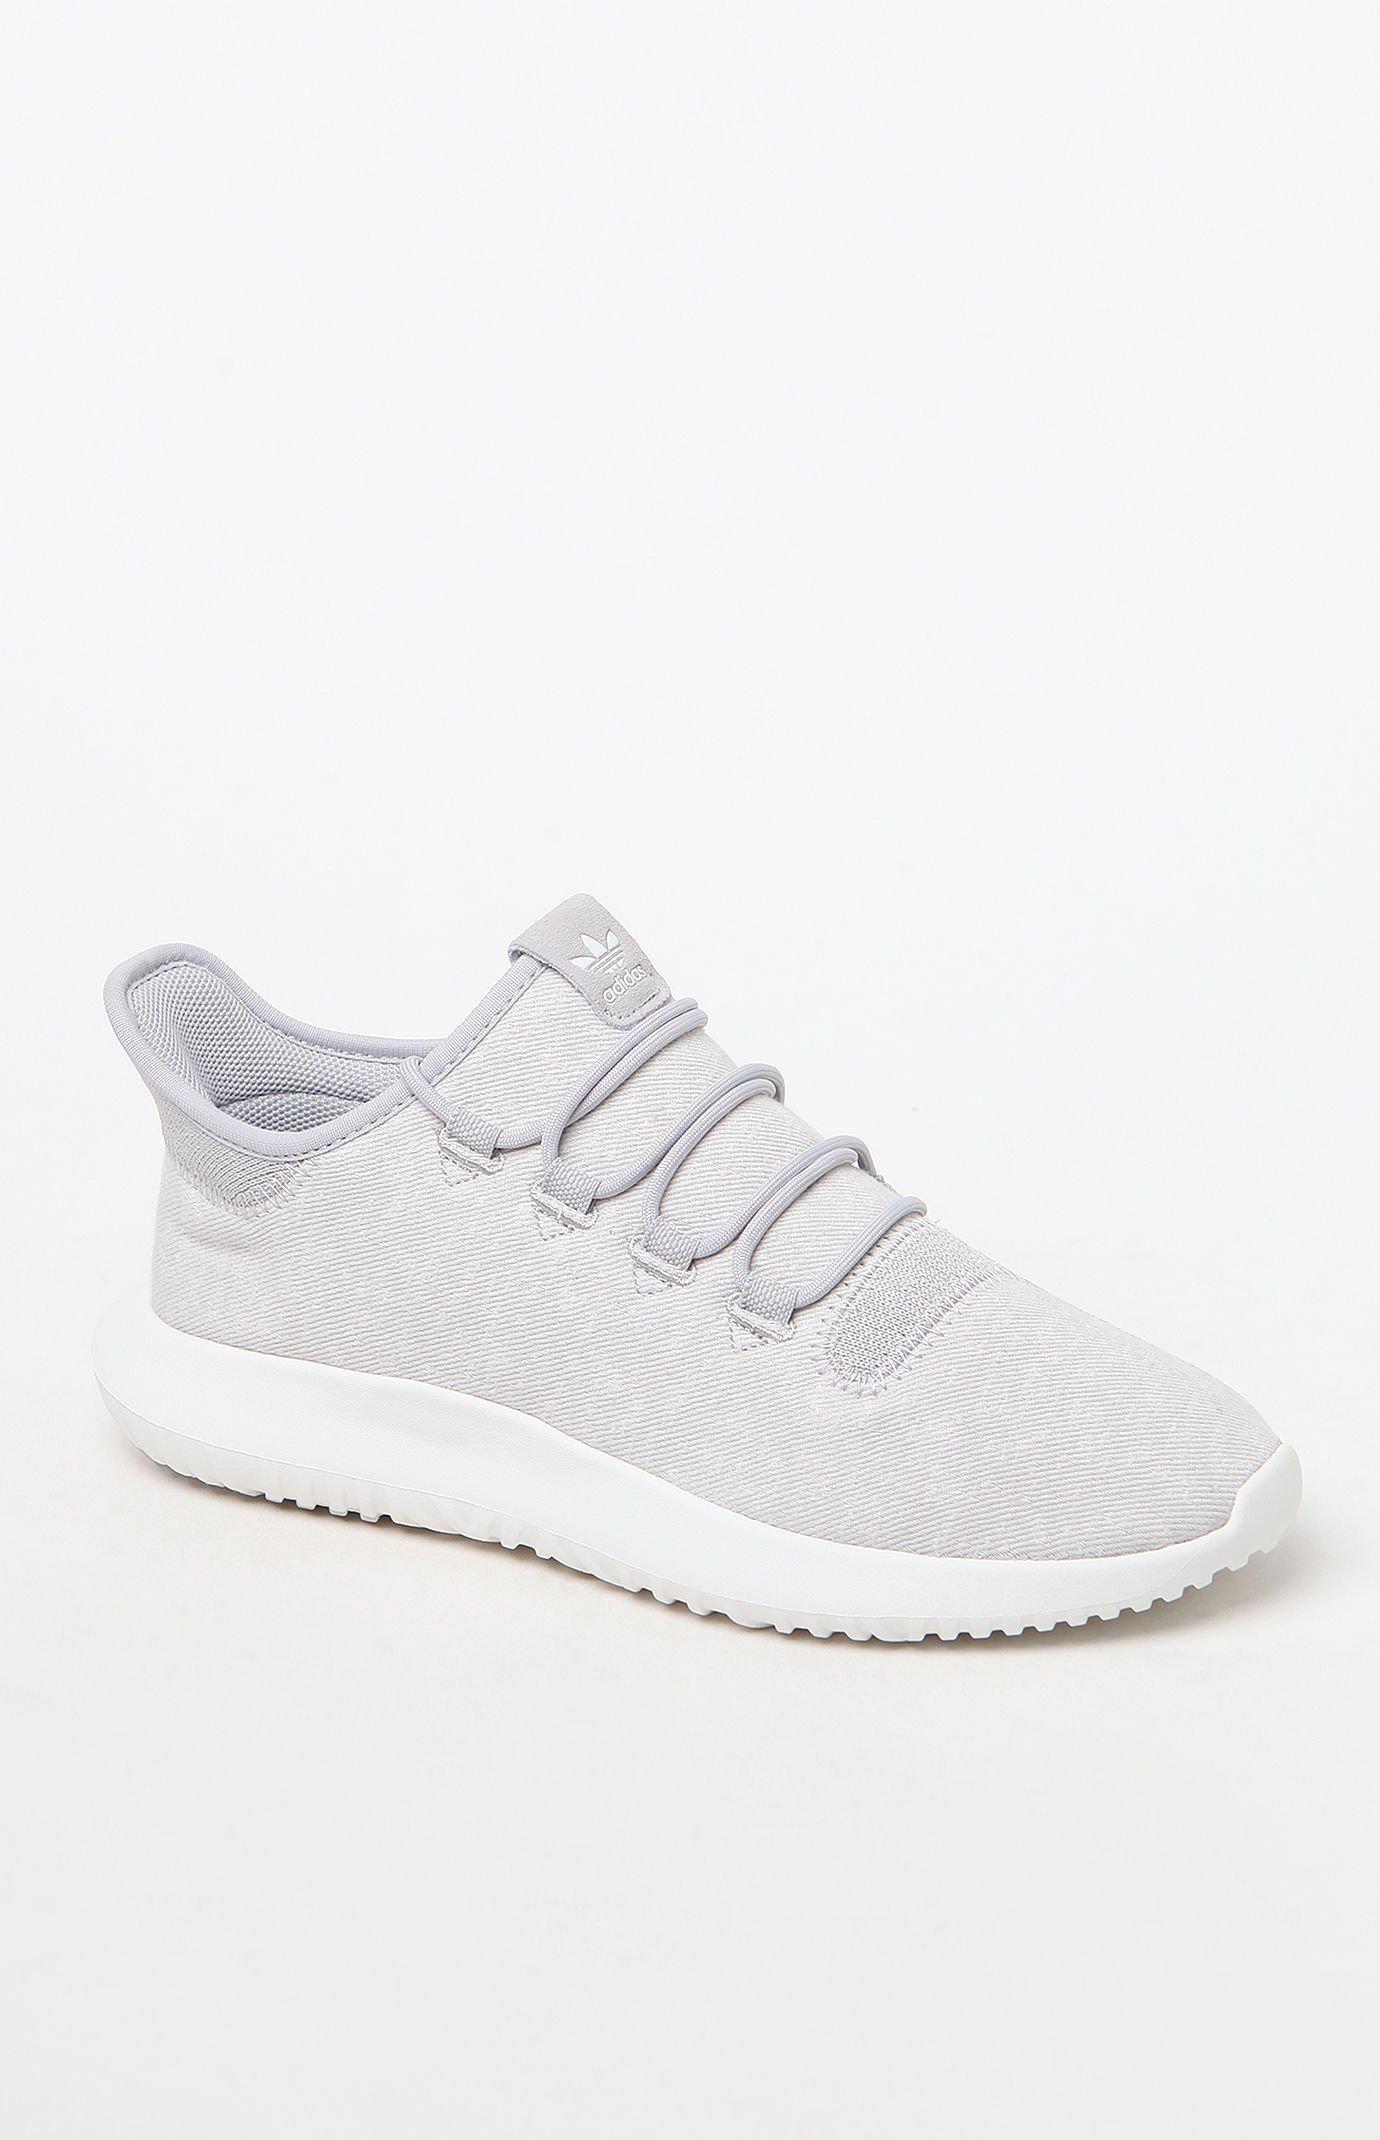 watch 8875c 56e51 Lyst - adidas Tubular Shadow Grey Shoes in Gray for Men